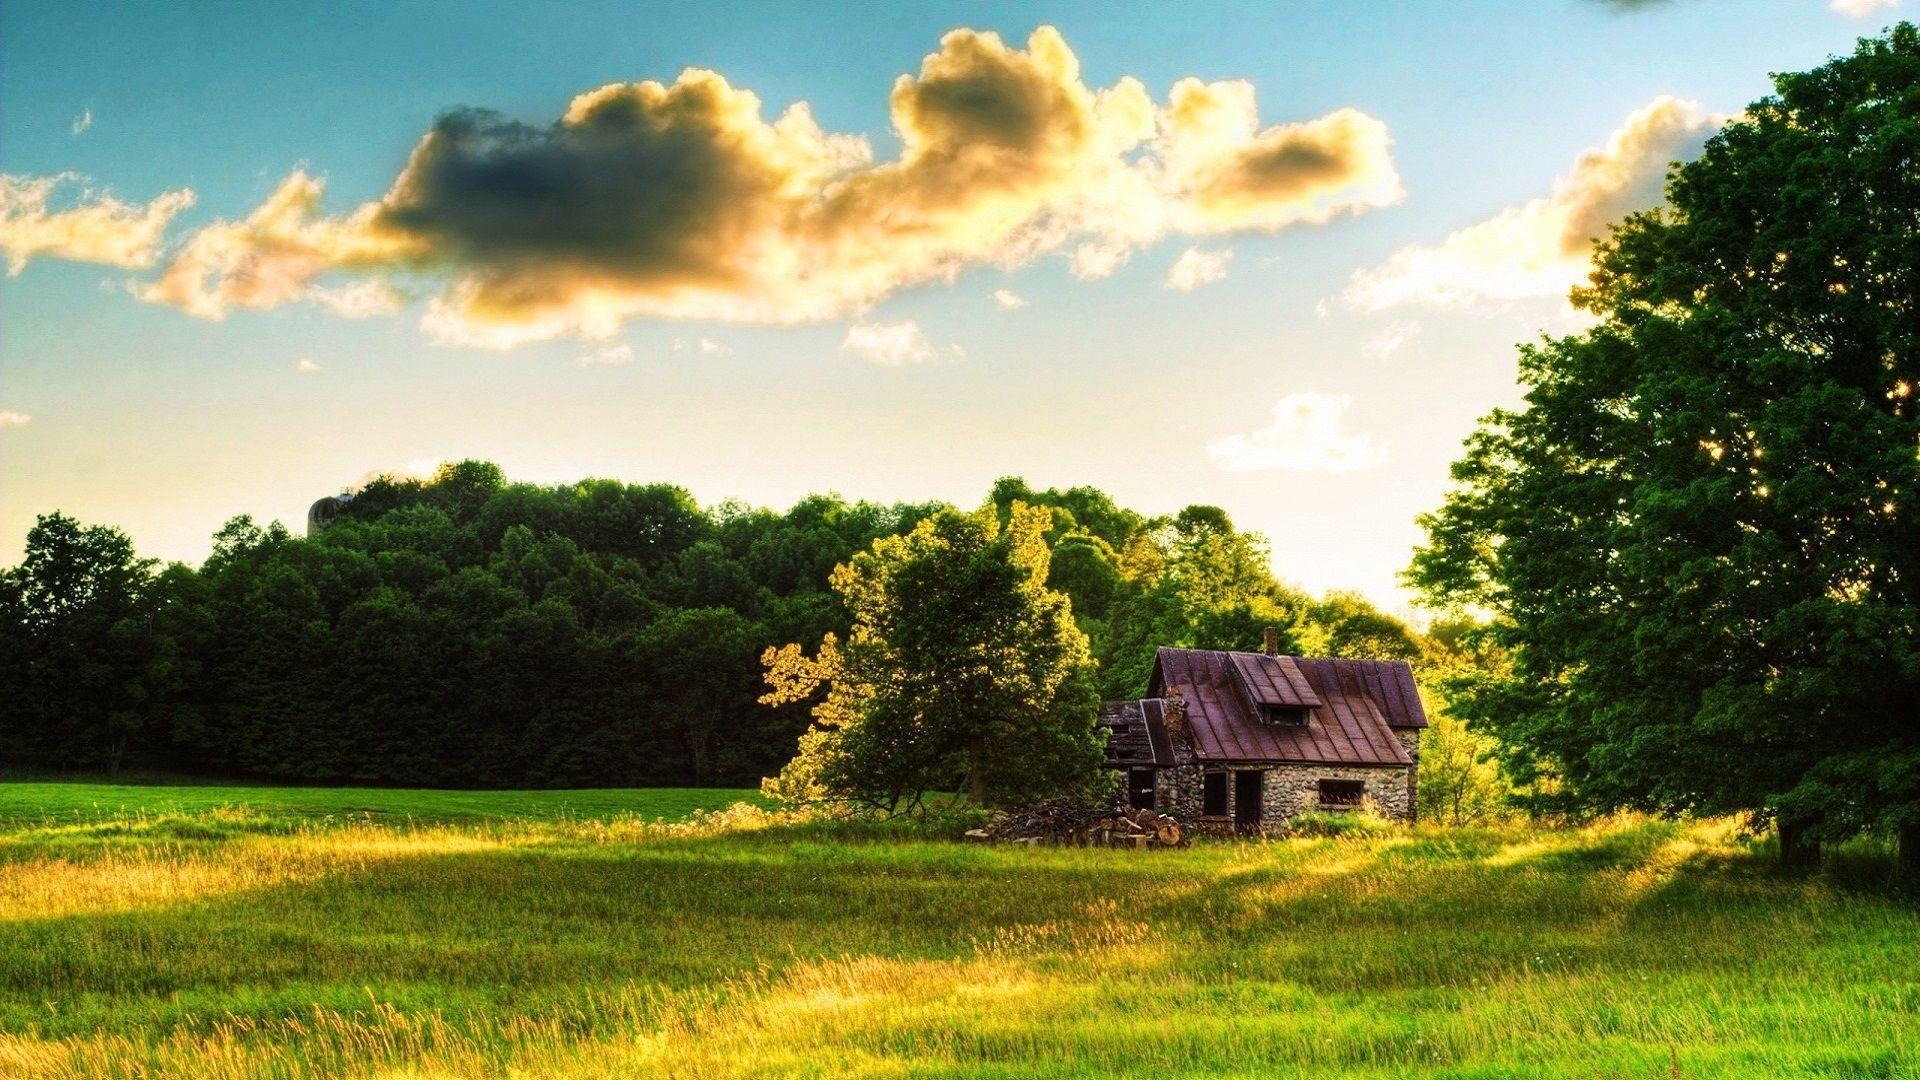 Farmhouse Desktop Wallpapers Top Free Farmhouse Desktop Backgrounds Wallpaperaccess